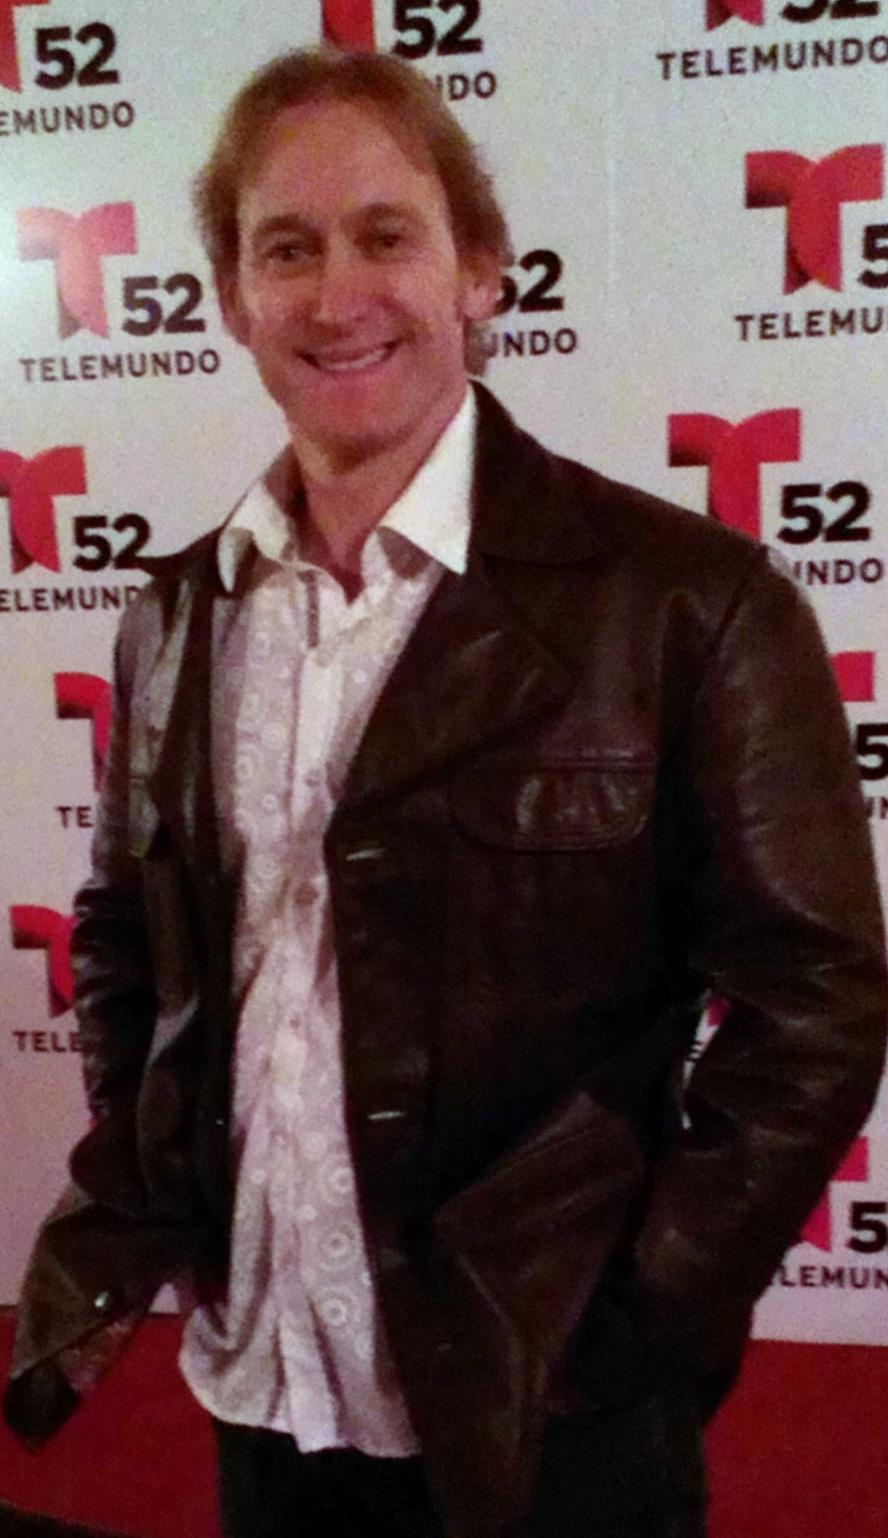 Candid Moment at 2013 Telemundo Awards